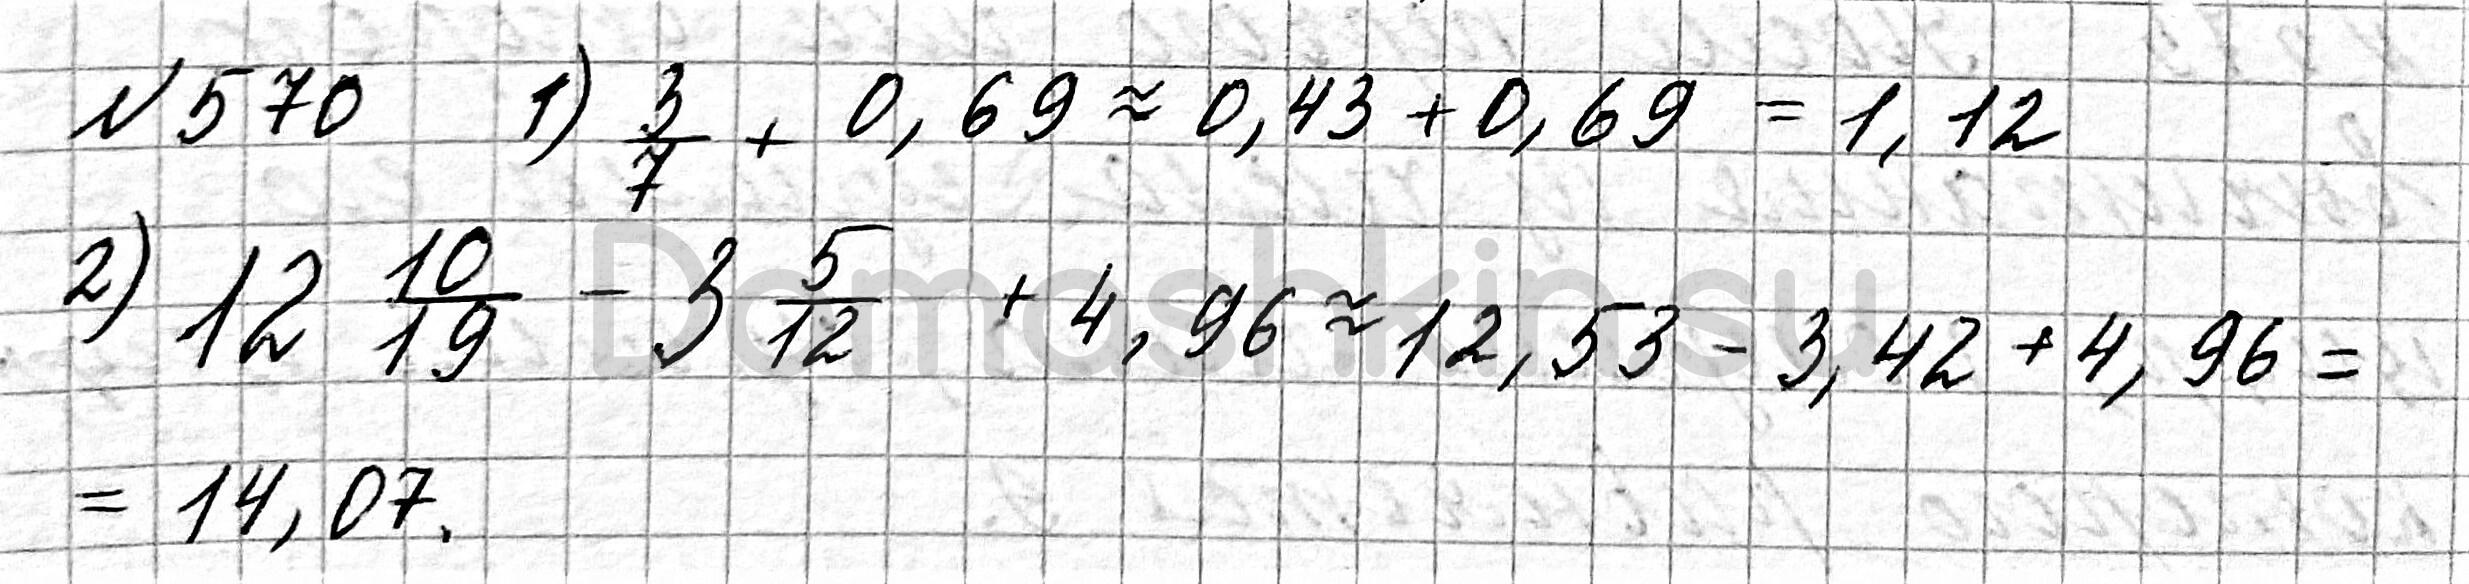 Математика 6 класс учебник Мерзляк номер 570 решение